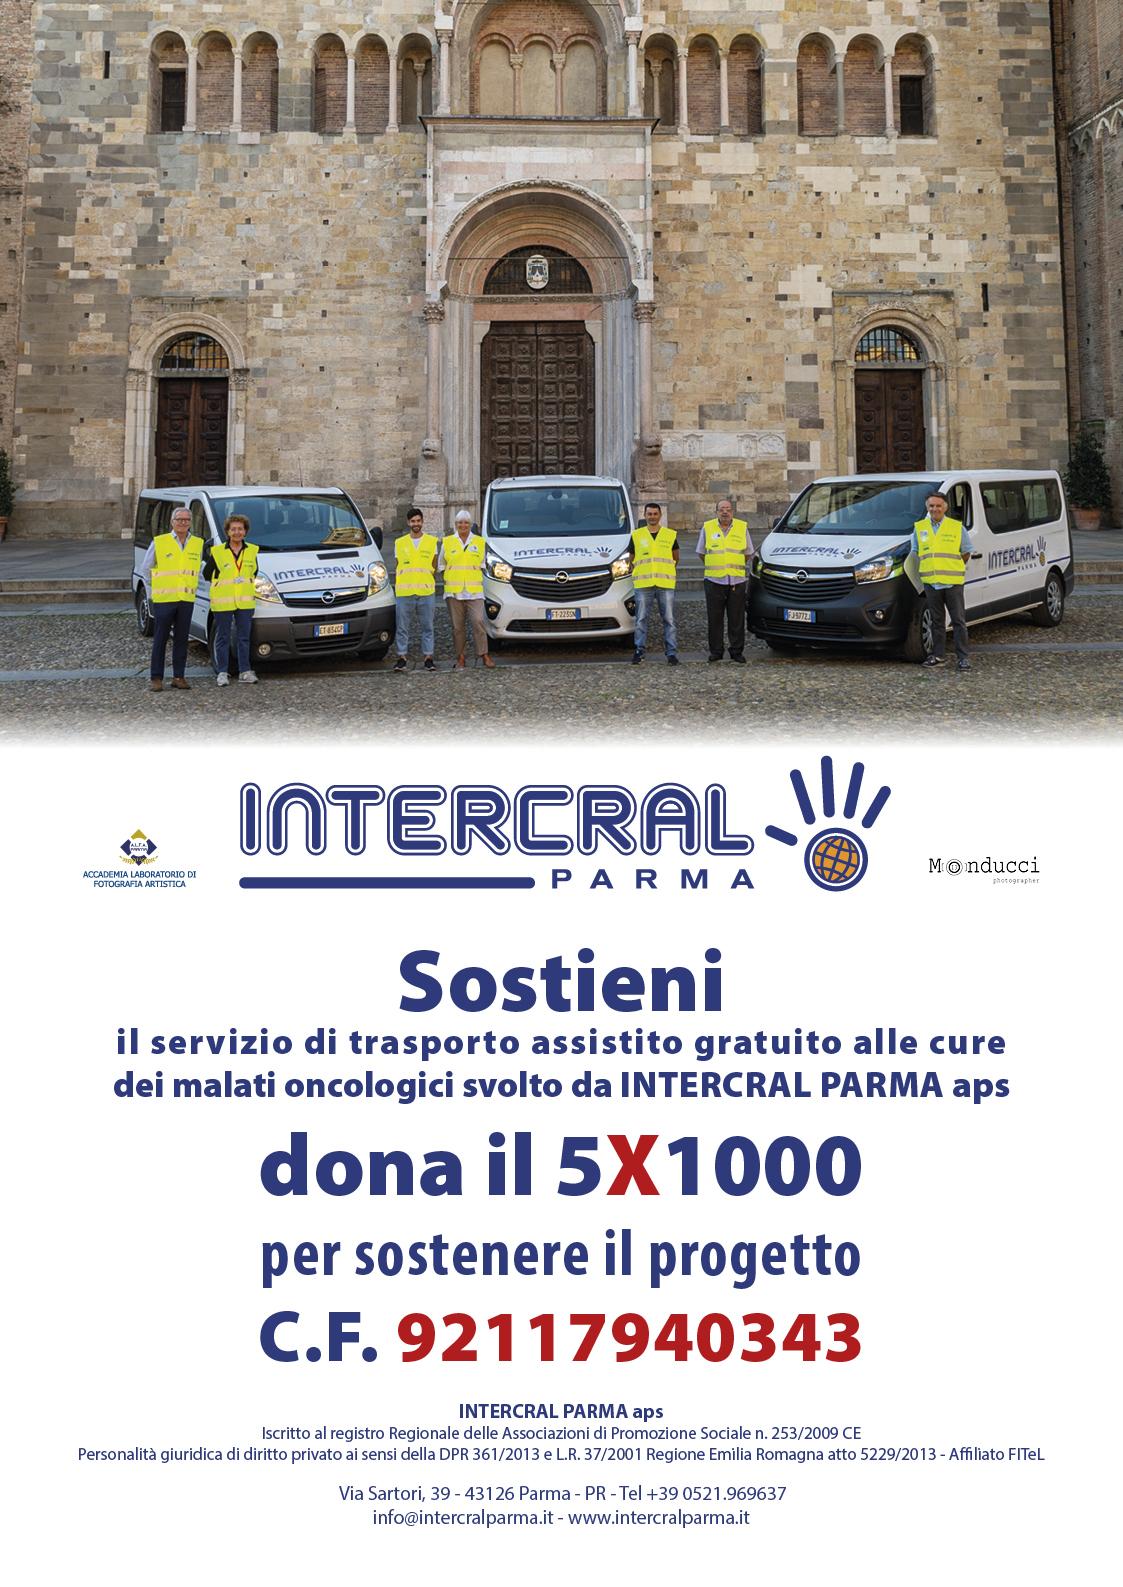 FOGLIO A3 2021 5x1000 INTERCRAL